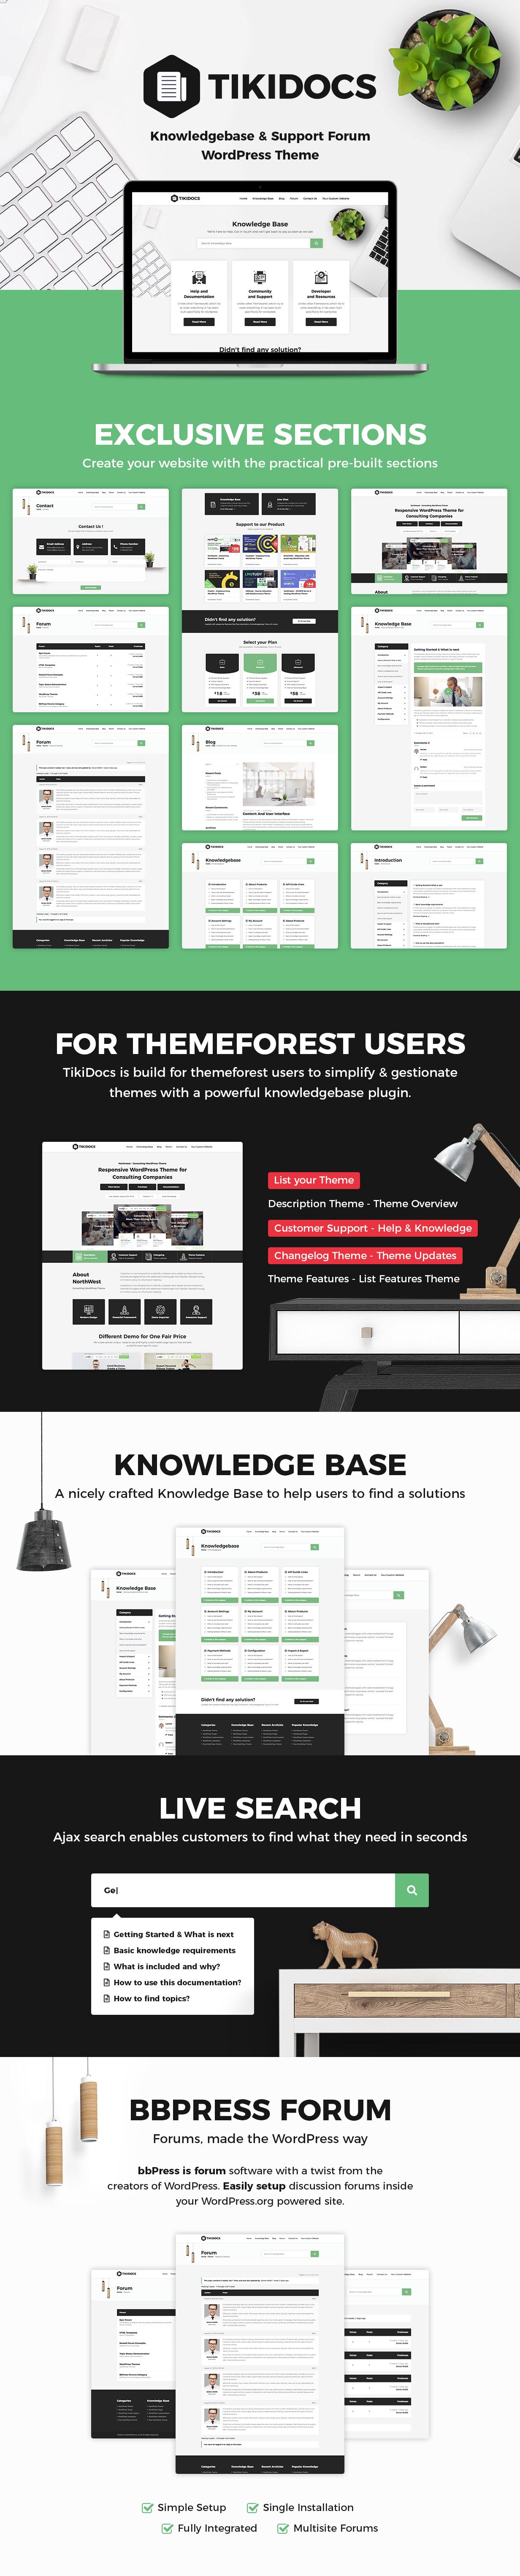 Tikidocs - Knowledgebase & Support Forum WordPress Theme + RTL - 2